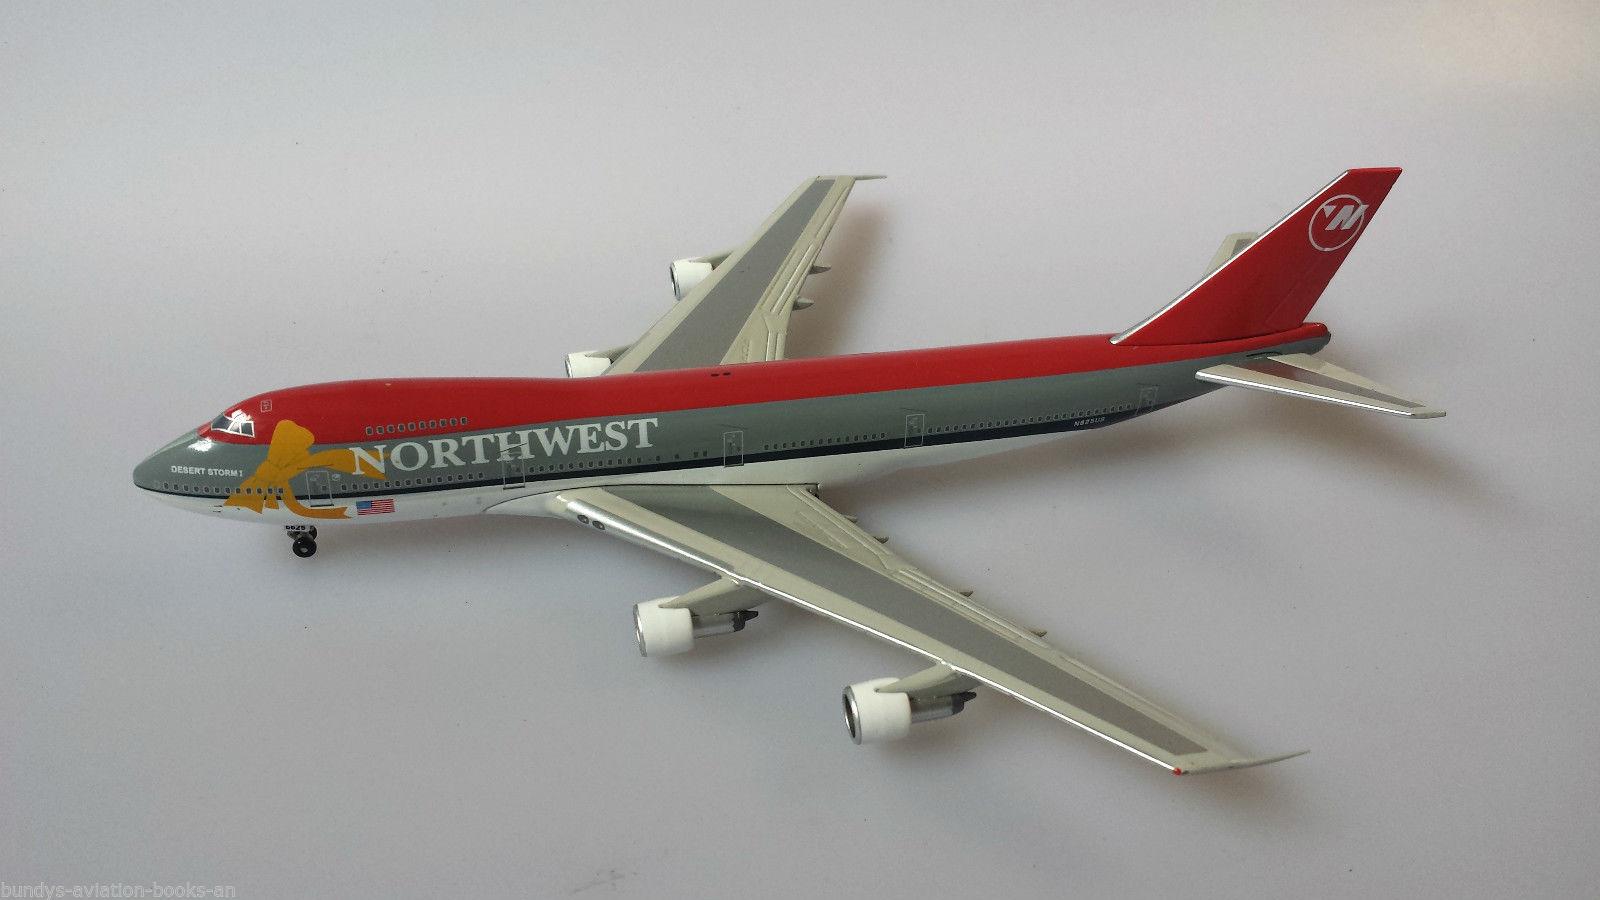 JFox Model Airliners - Northwest B747-251B N625US